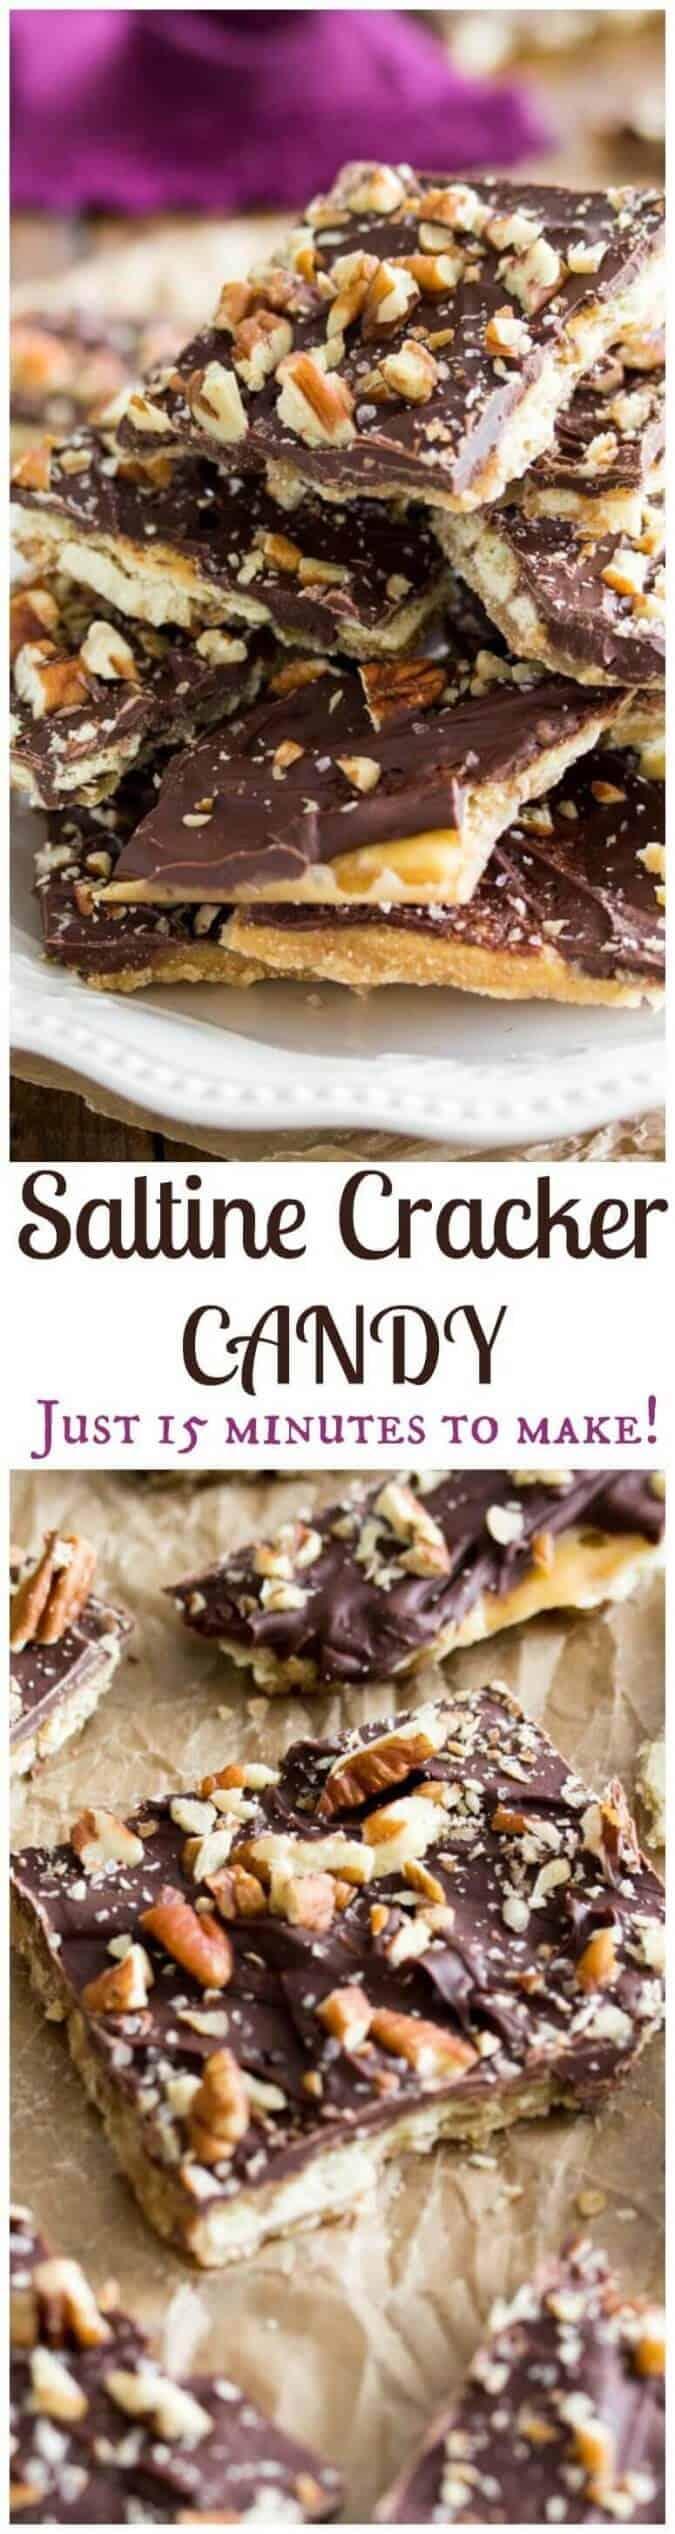 find recipe for saltine cracker candy